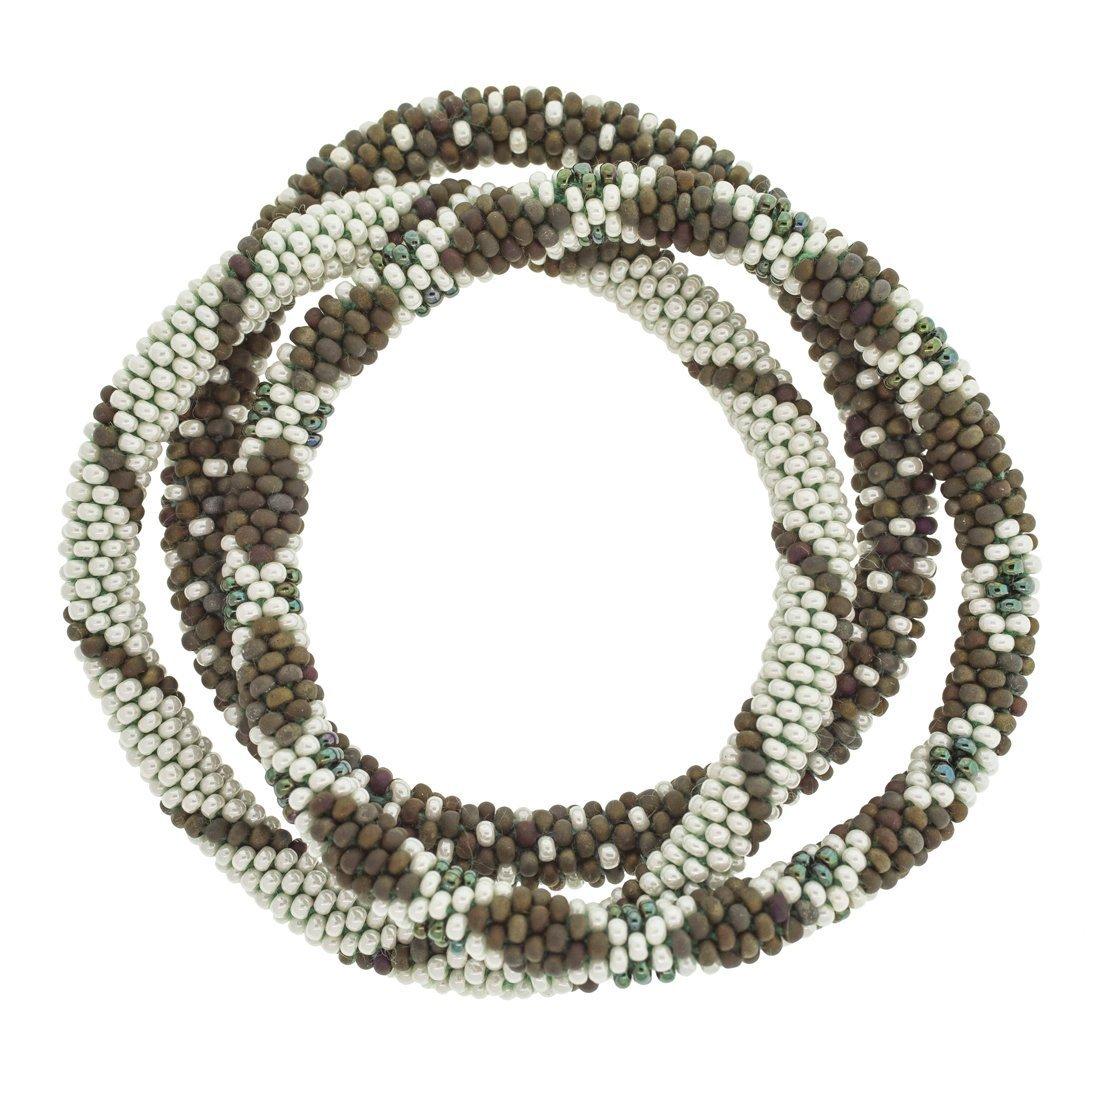 3 sæt Perle armbånd Glamping